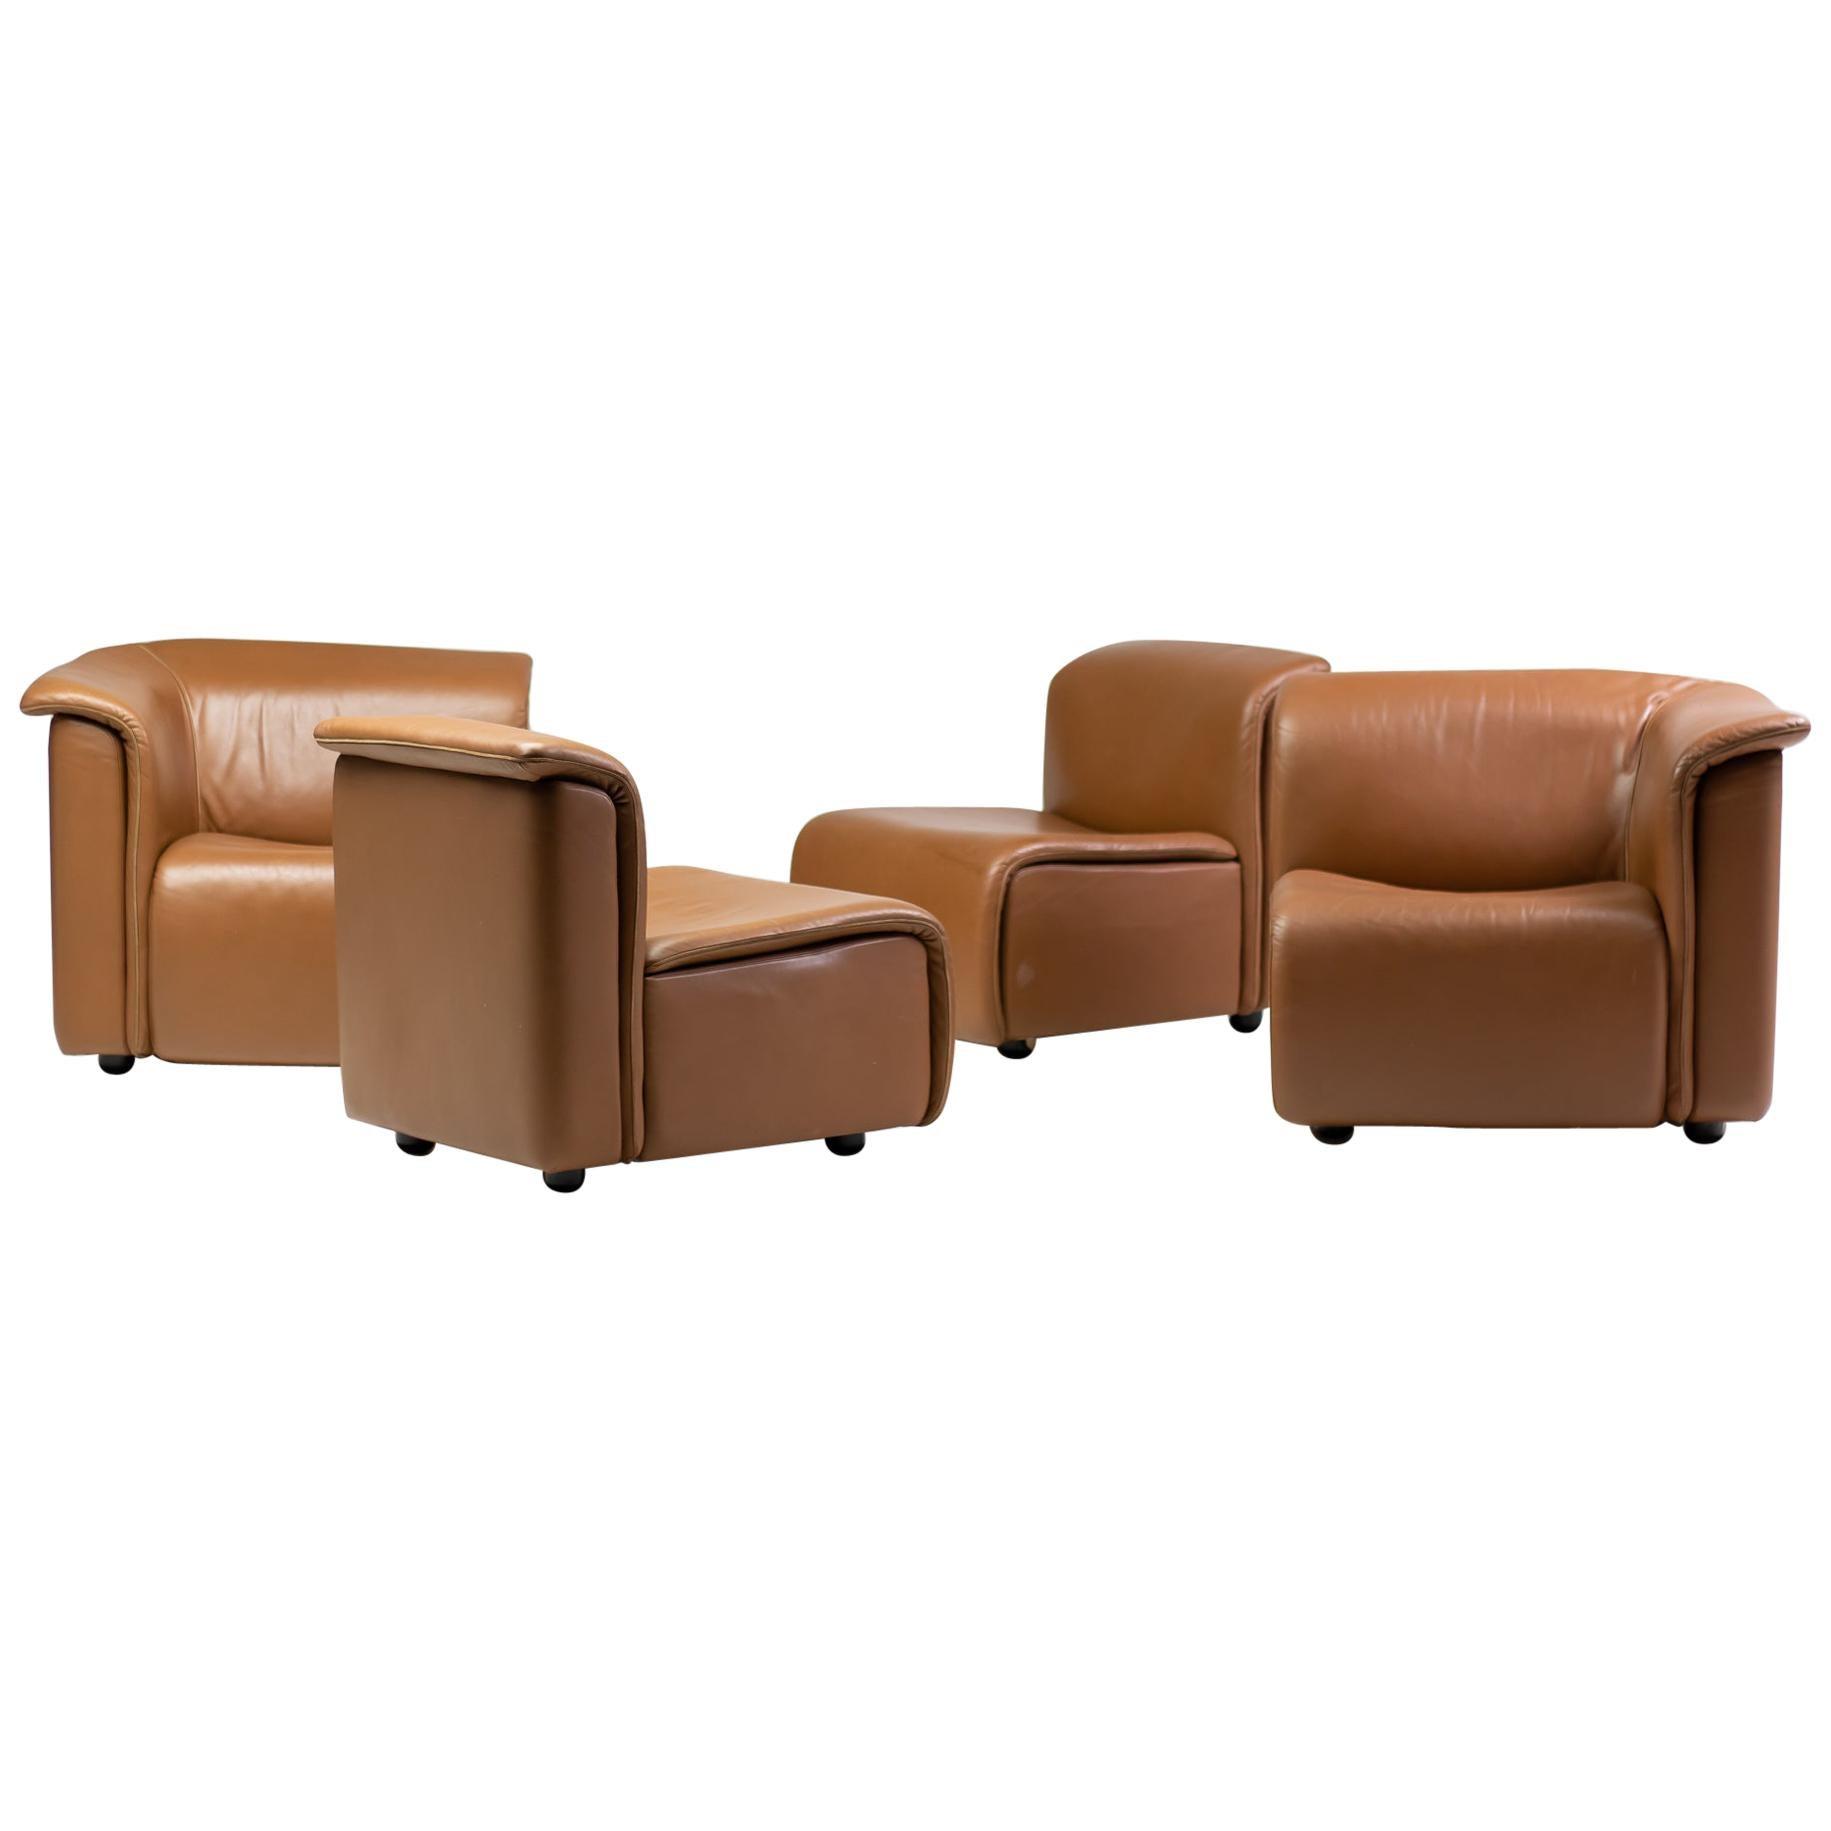 Modular Sofa by Wittmann Moebelwerkstaetten